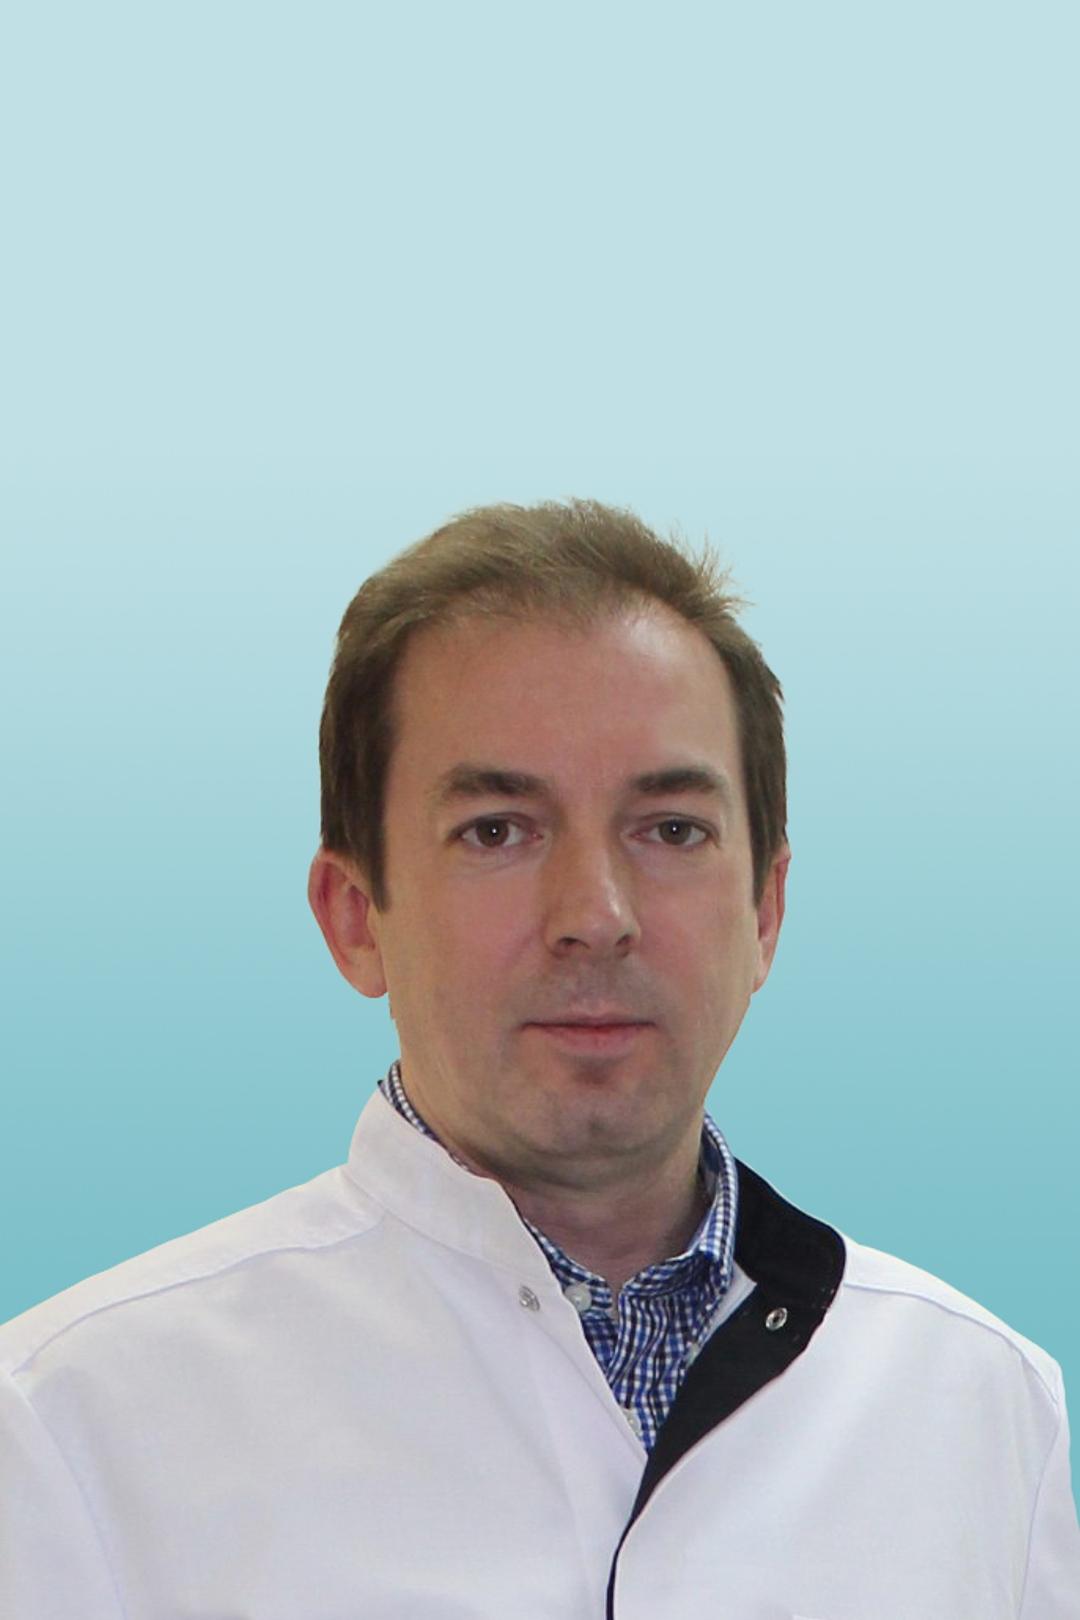 Онколог-маммолог, пластический хирург Братик Александр Владимирович